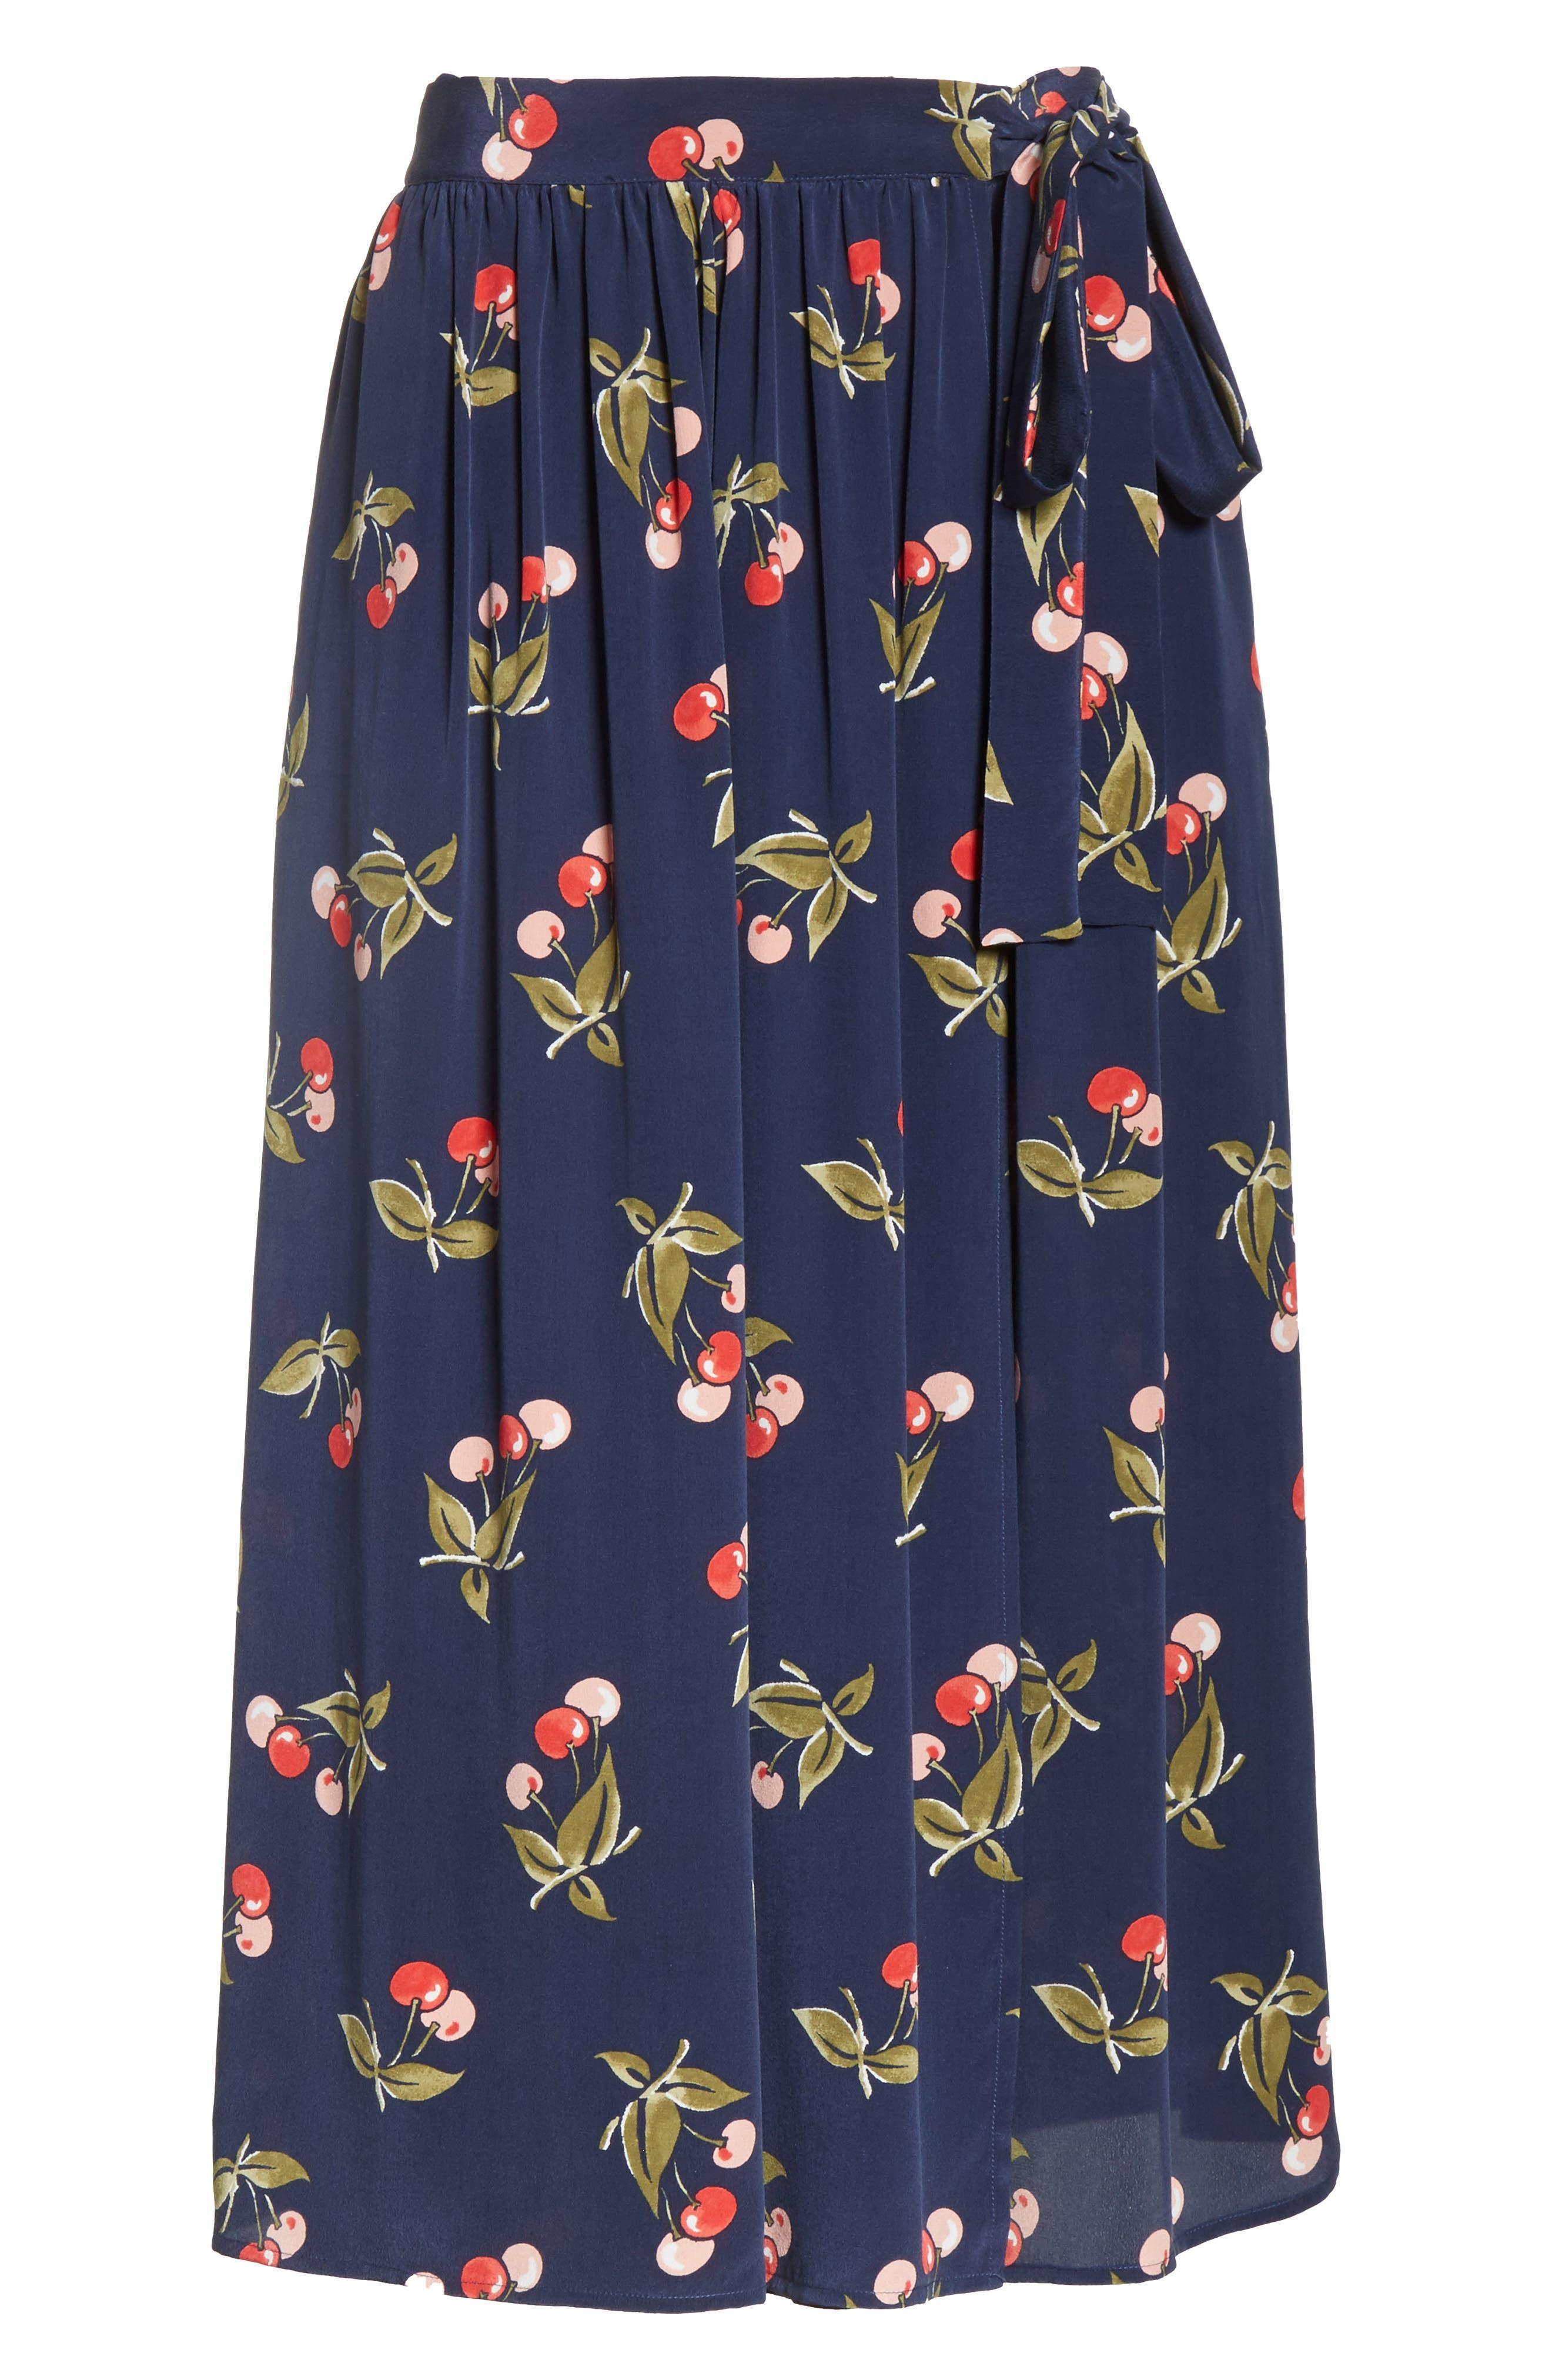 Almudena Cherry Print Silk Wrap Skirt,                             Alternate thumbnail 6, color,                             Dark Navy